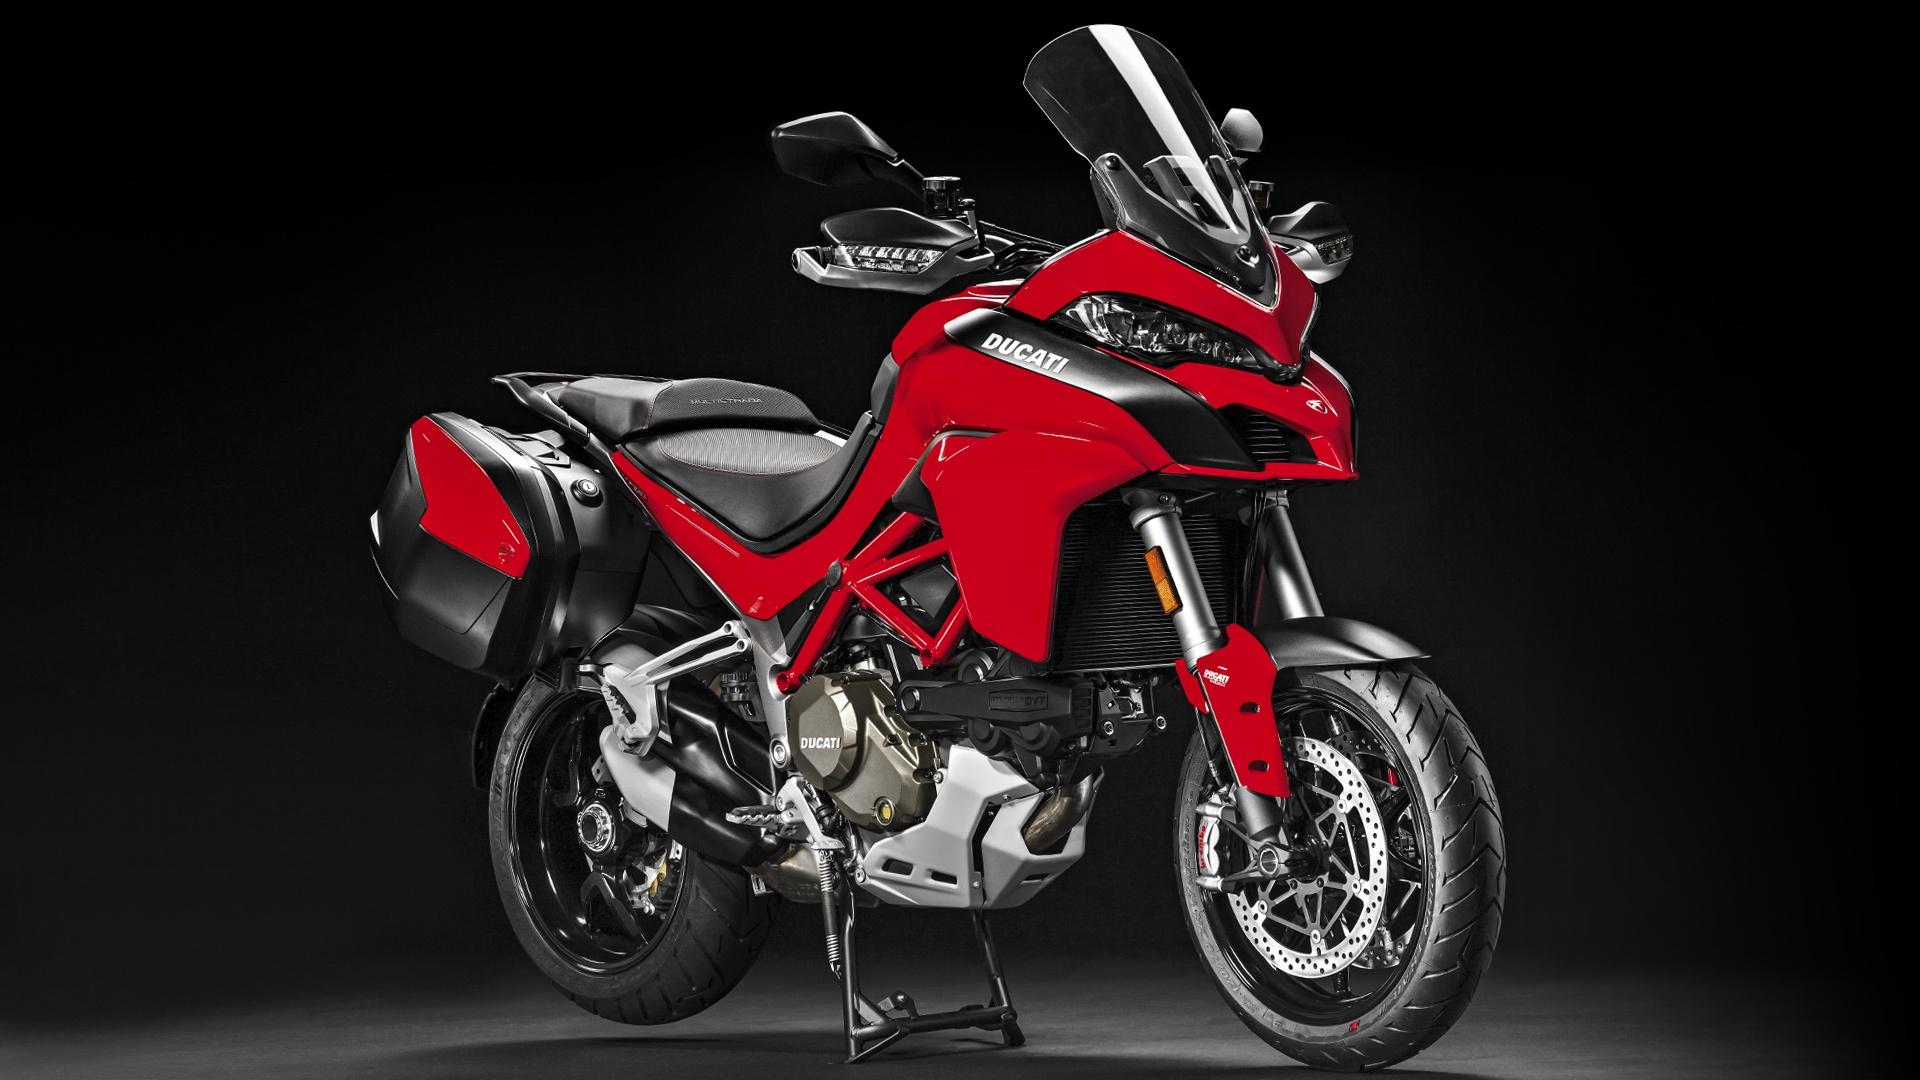 МОТОЦИКЛ DUCATI MULTISTRADA 1200 S  Артмото - купить квадроцикл в украине и харькове, мотоцикл, снегоход, скутер, мопед, электромобиль